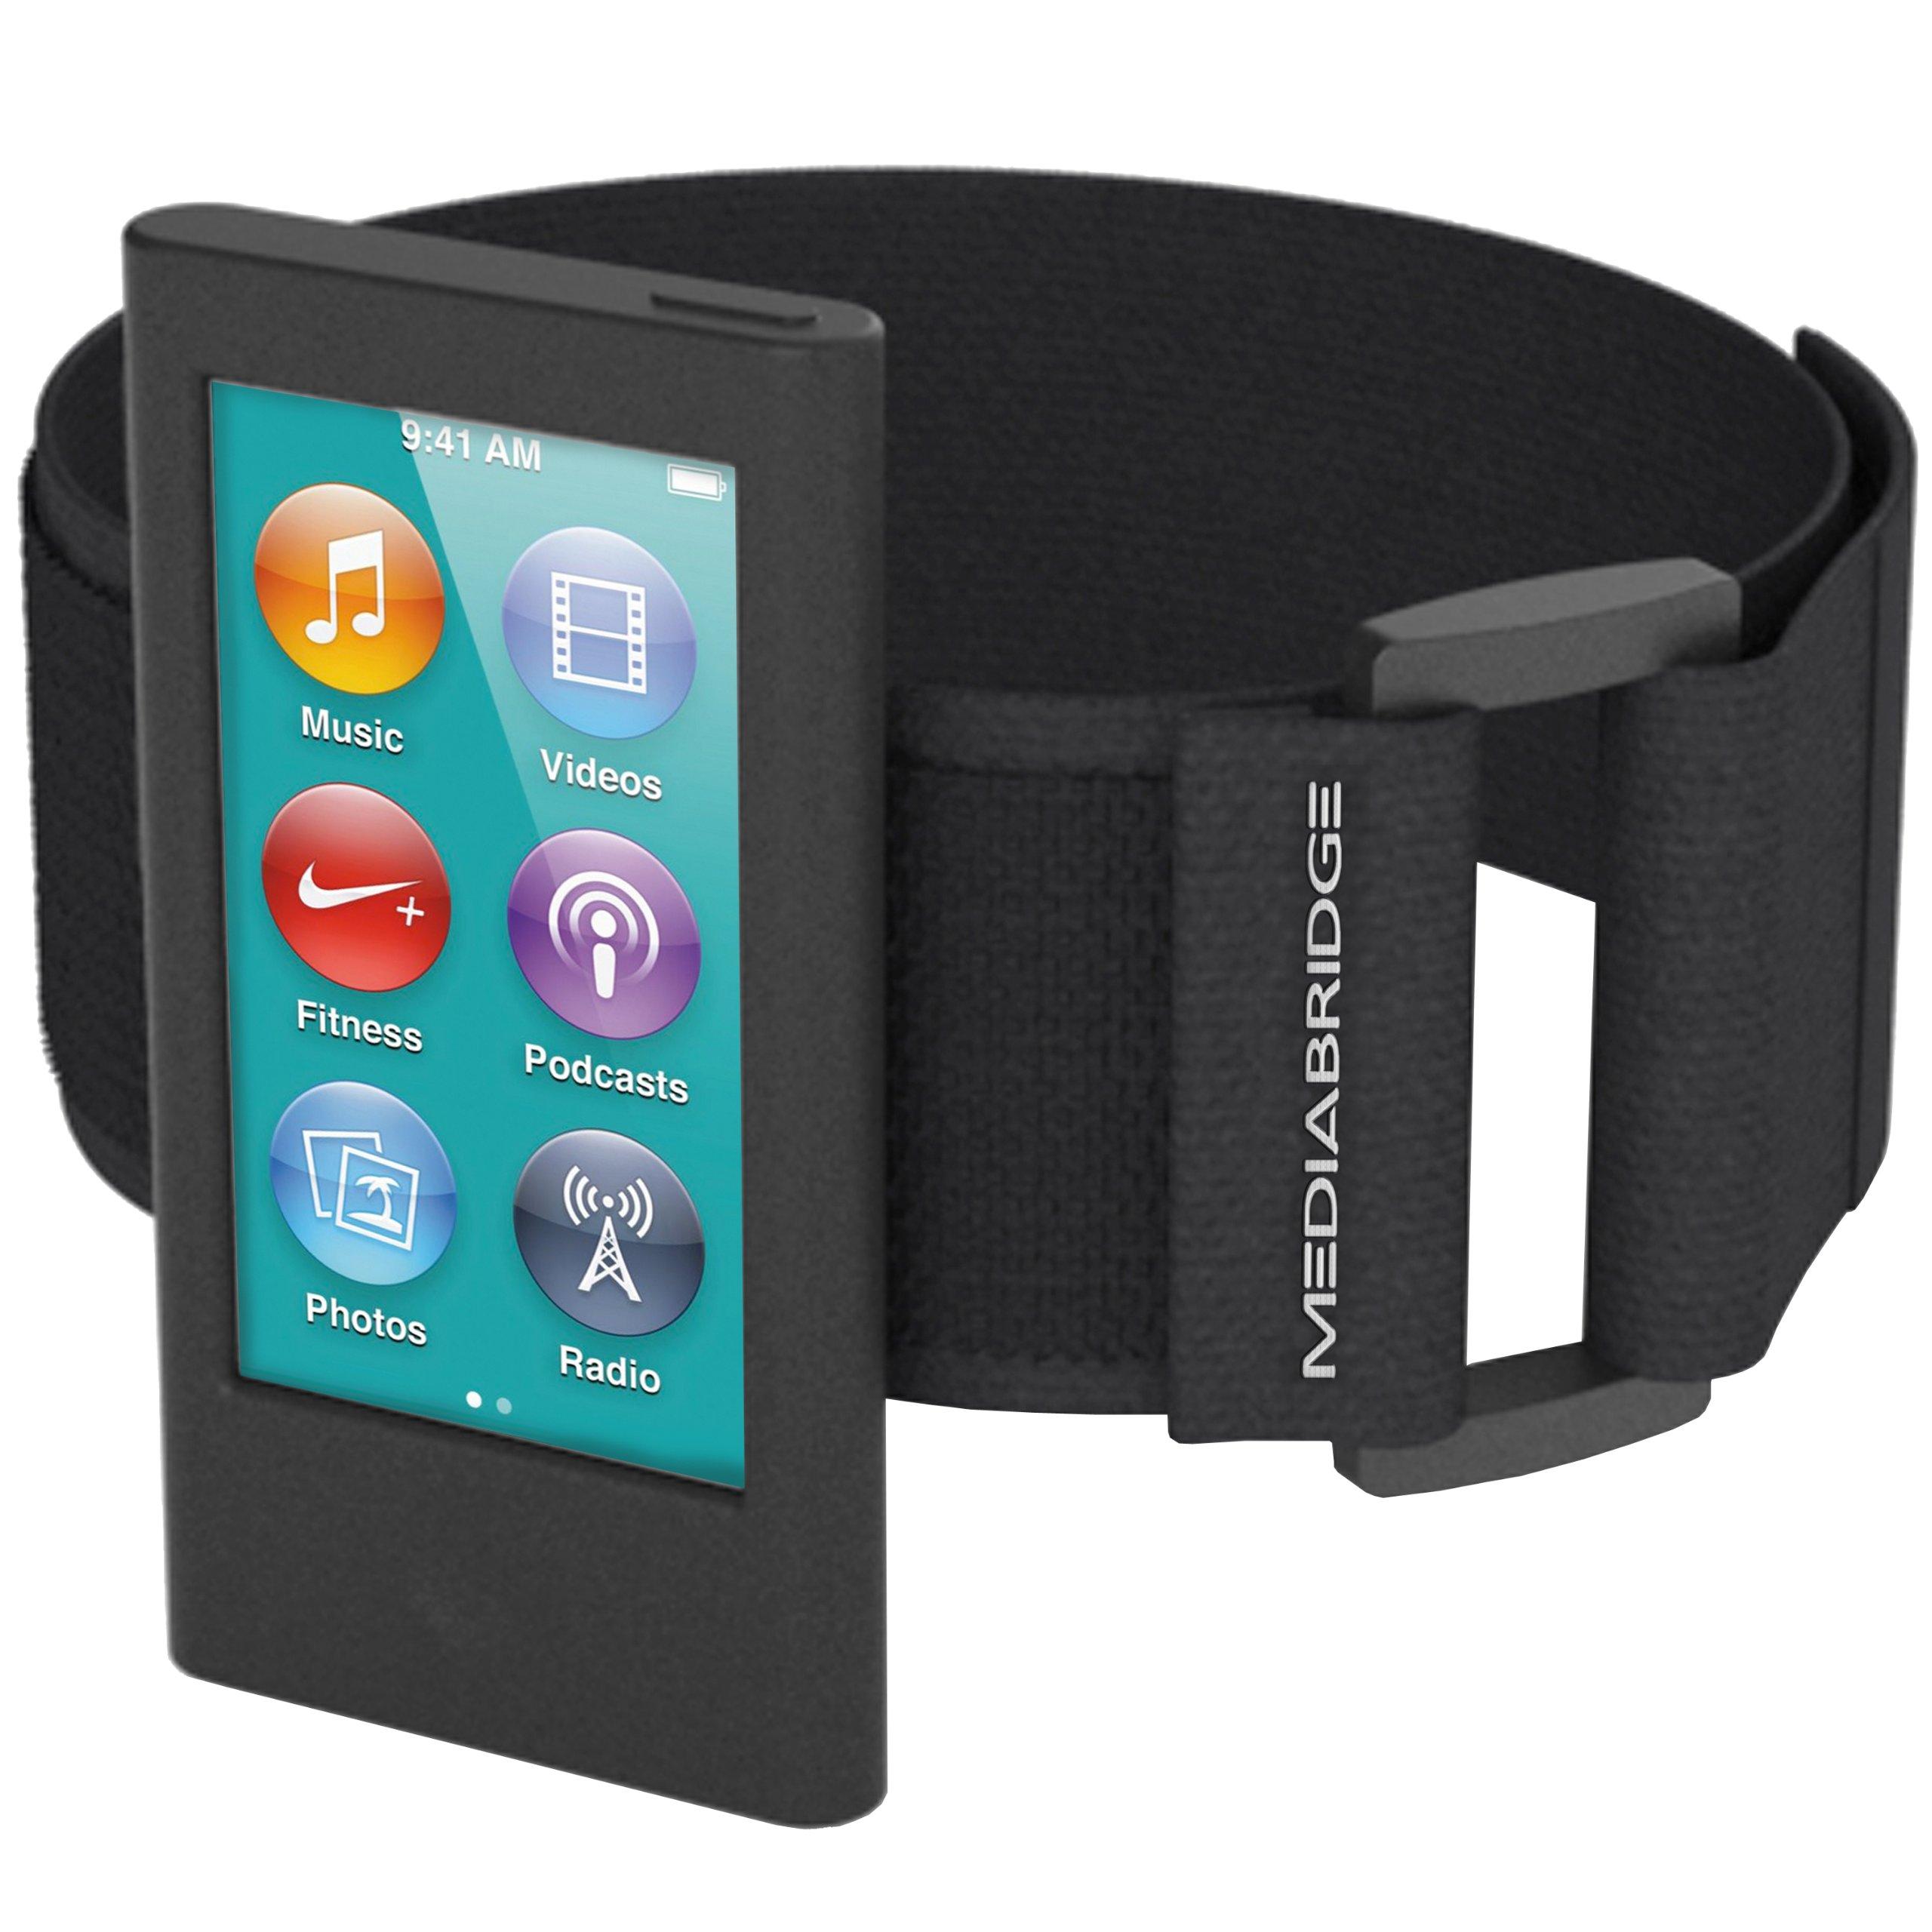 Mediabridge Armband iPod Nano AB1 IPN7 BLACK